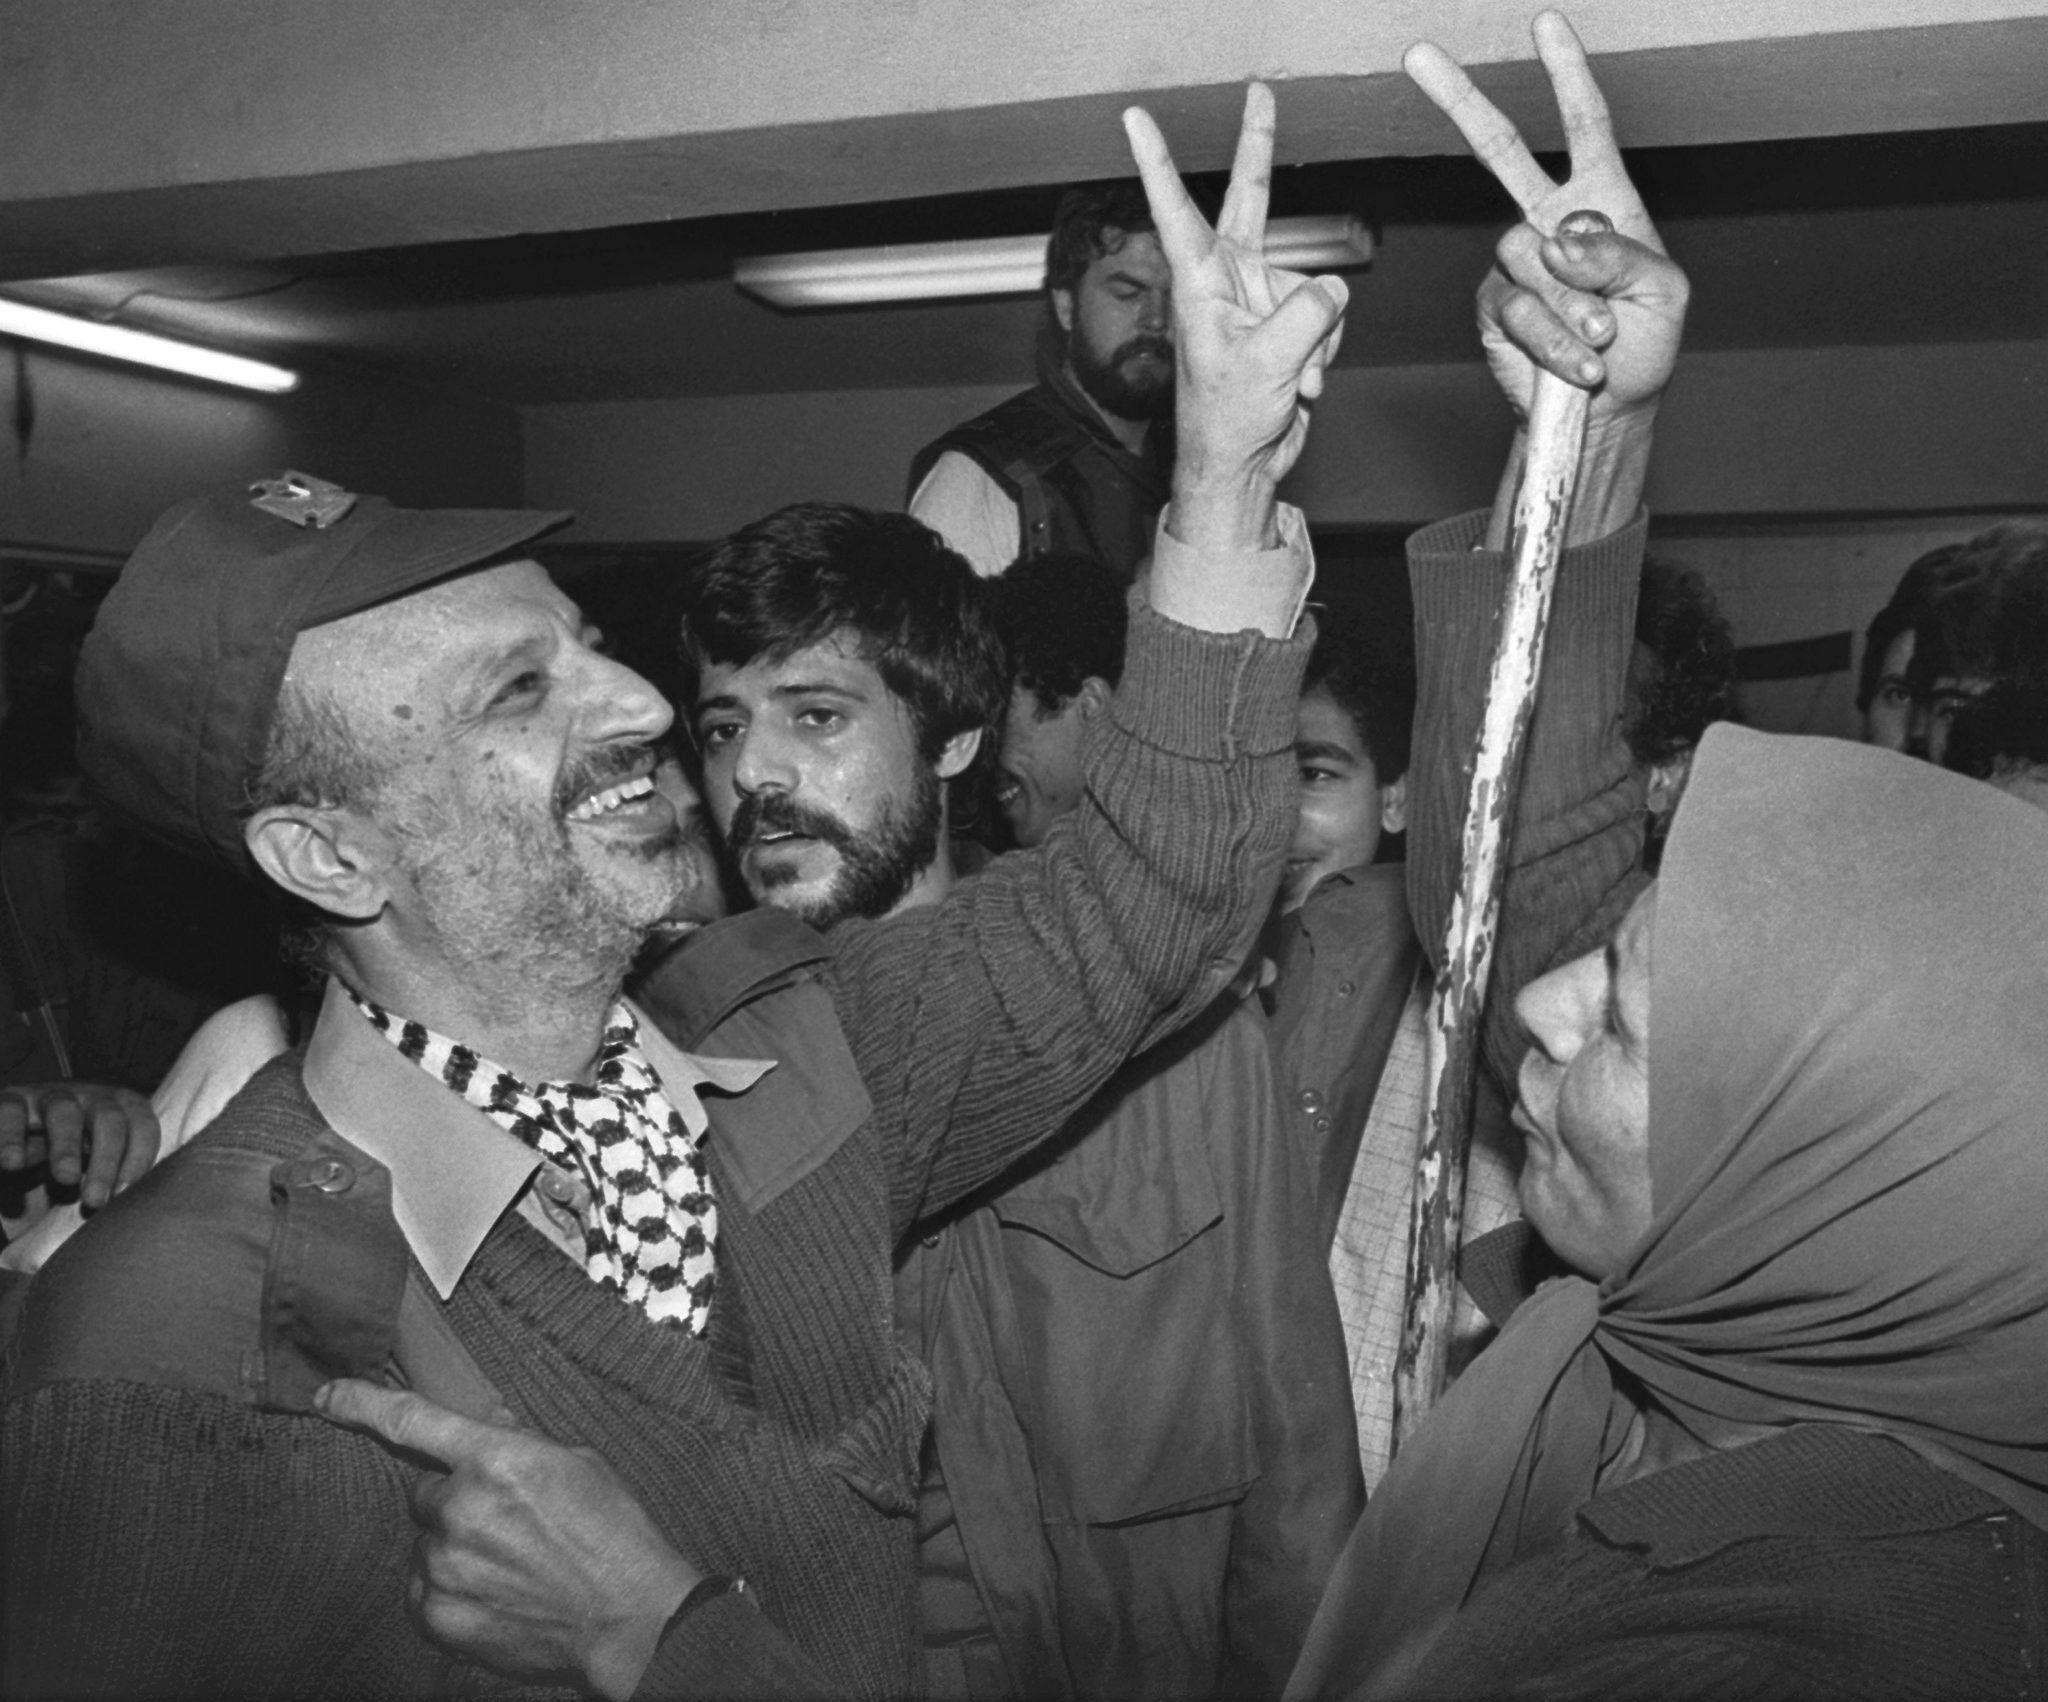 El líder de la OLP, Yaser Arafat. EPA/JIM HOLLANDER B/W ONLY/Archivo